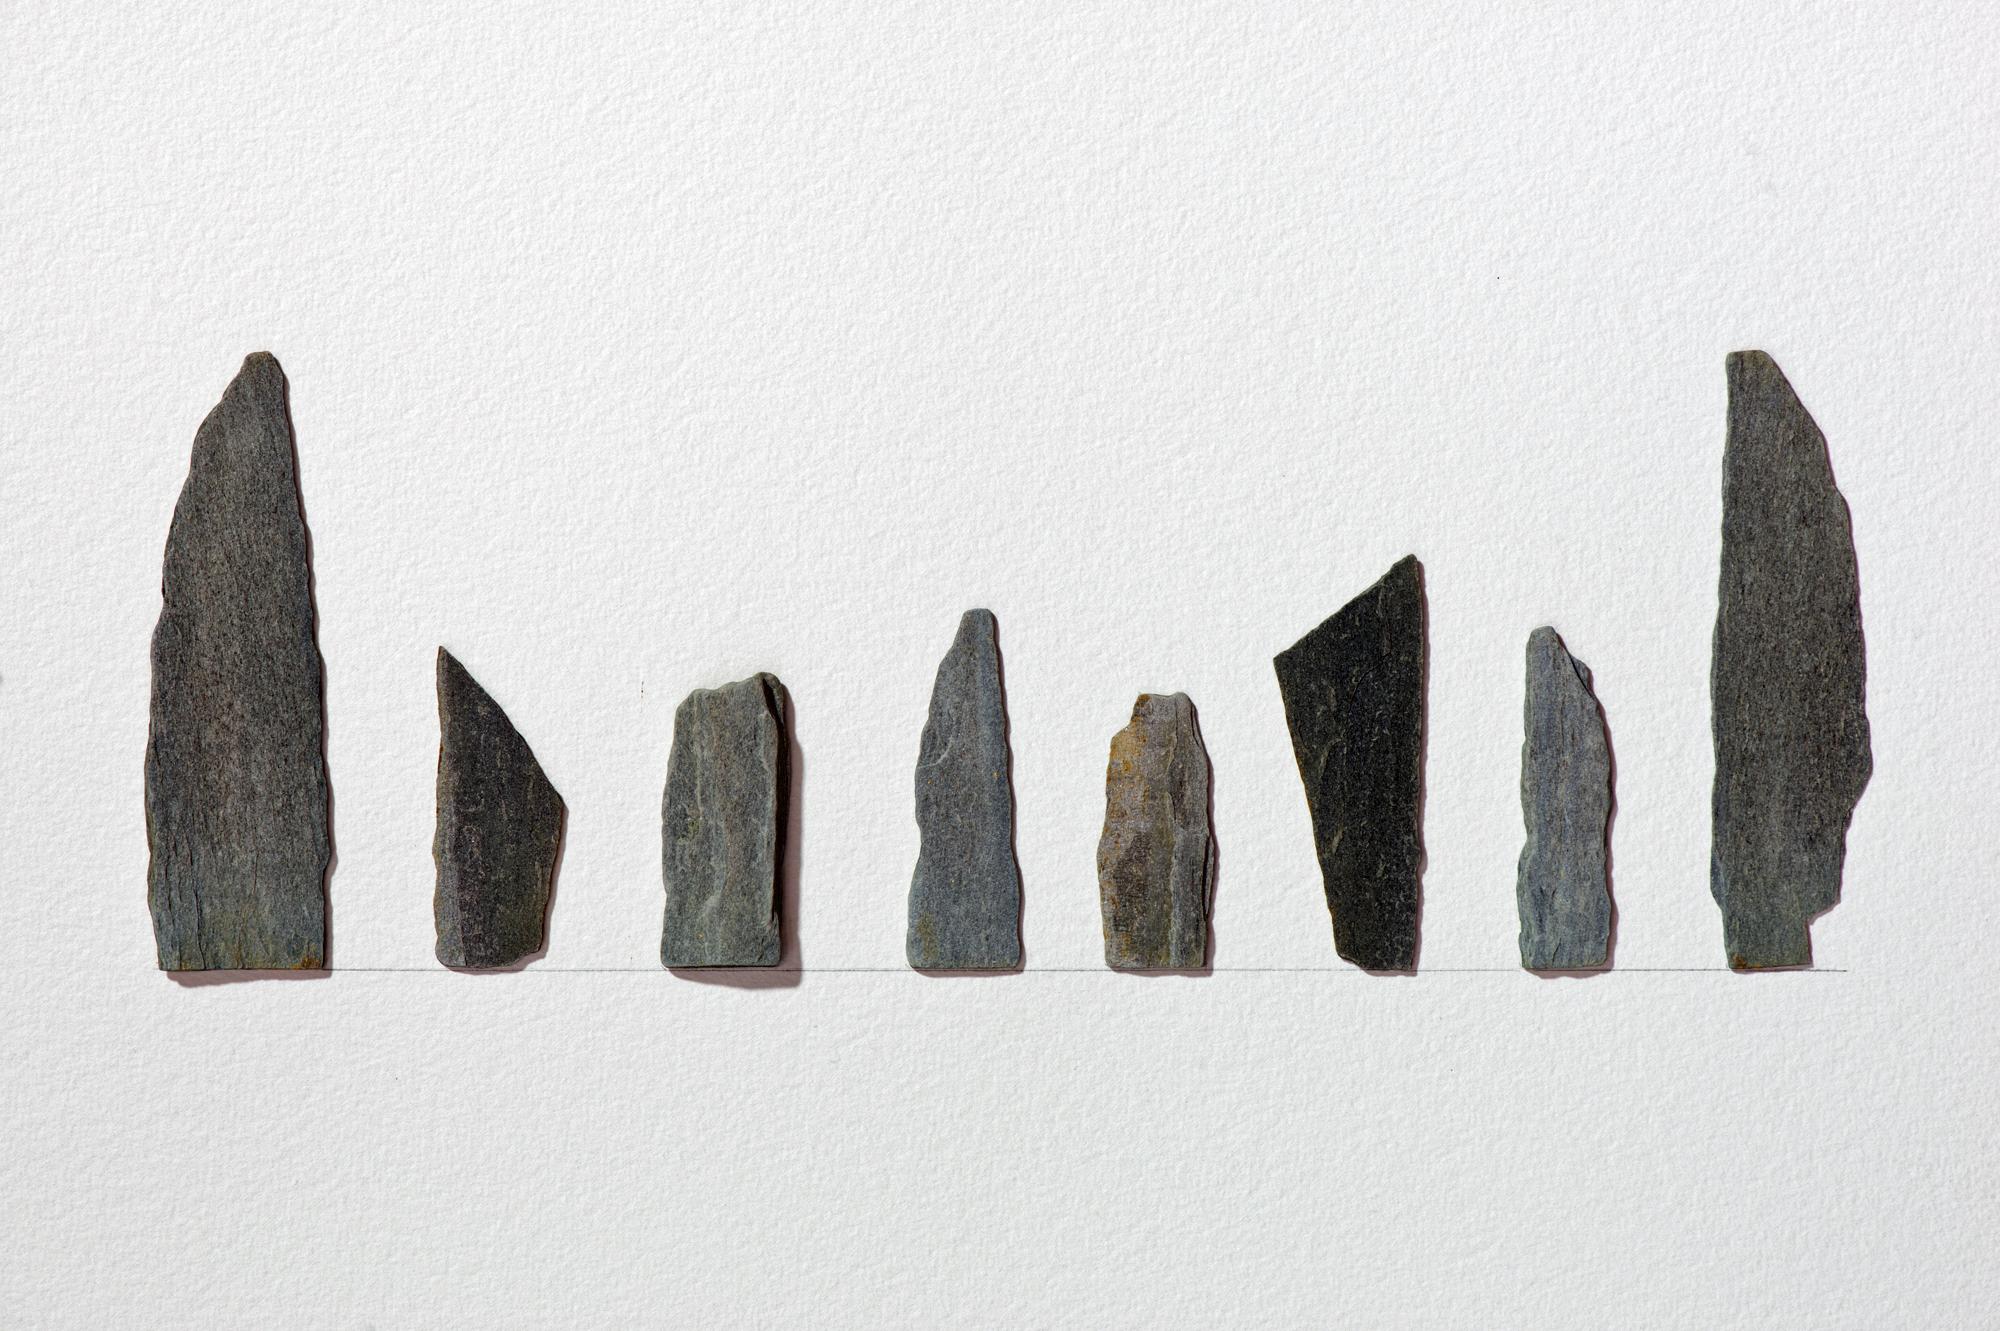 Stone Silhouette 2 (detail).JPG